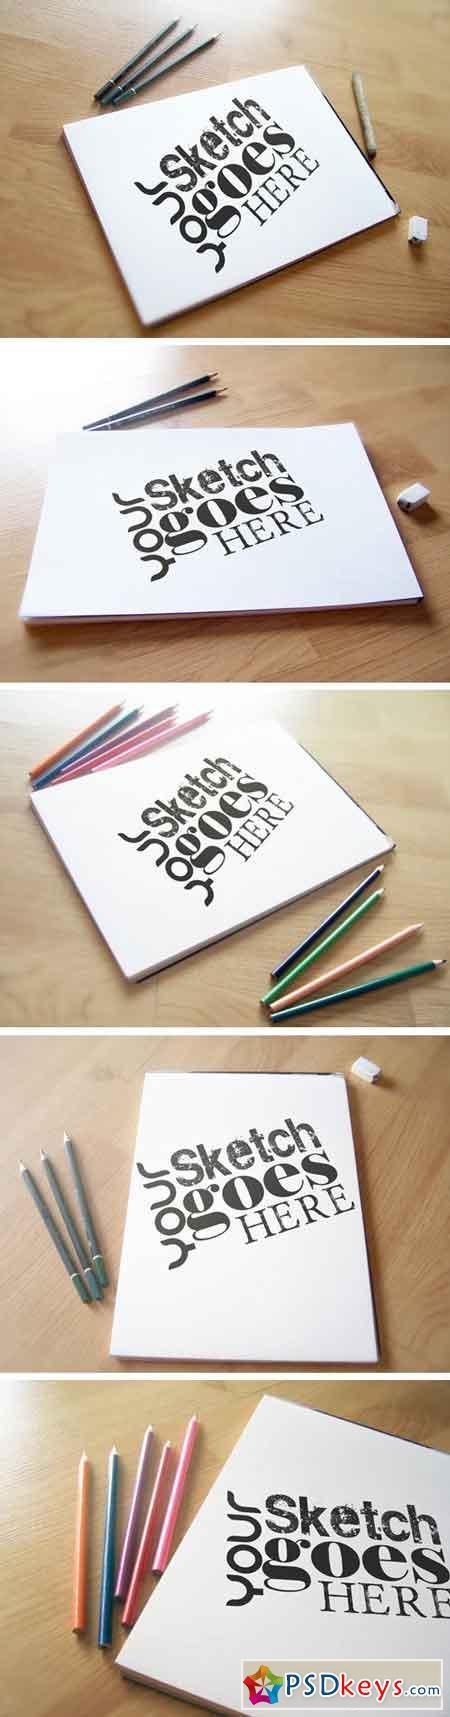 Sketchpad Mockup Pack 1436138 » Free Download Photoshop